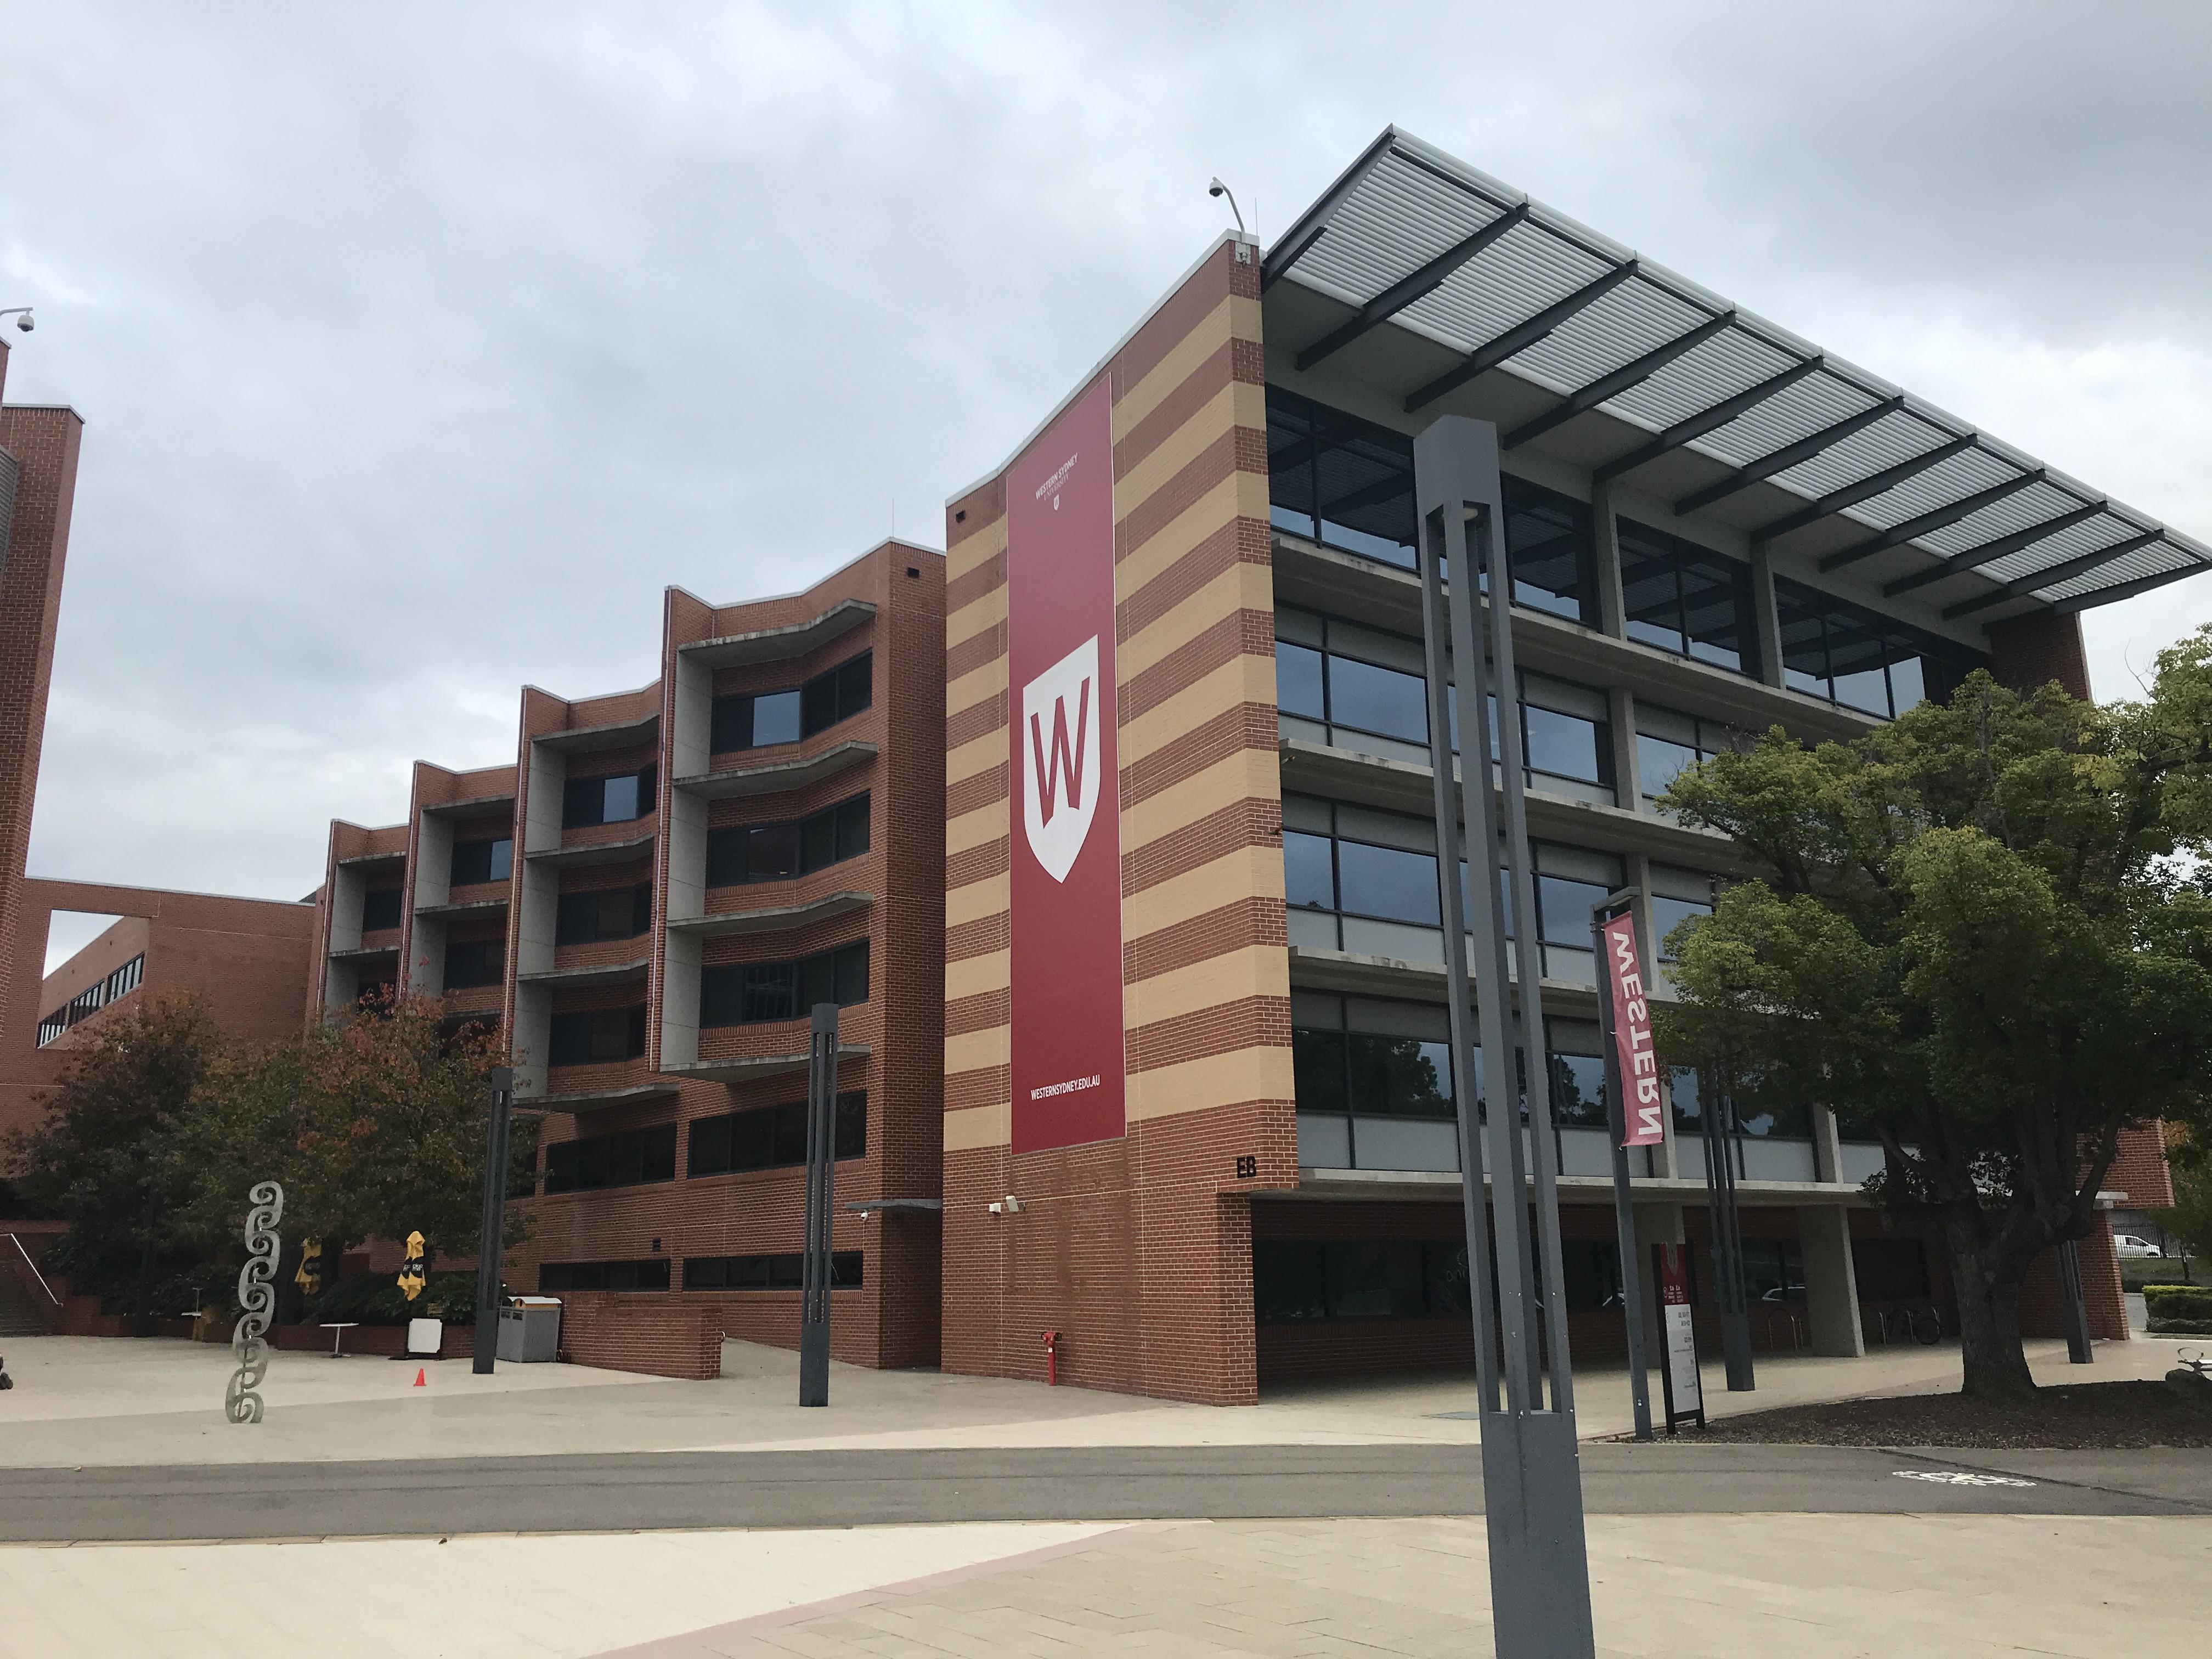 Building EB at Parramatta South Campus